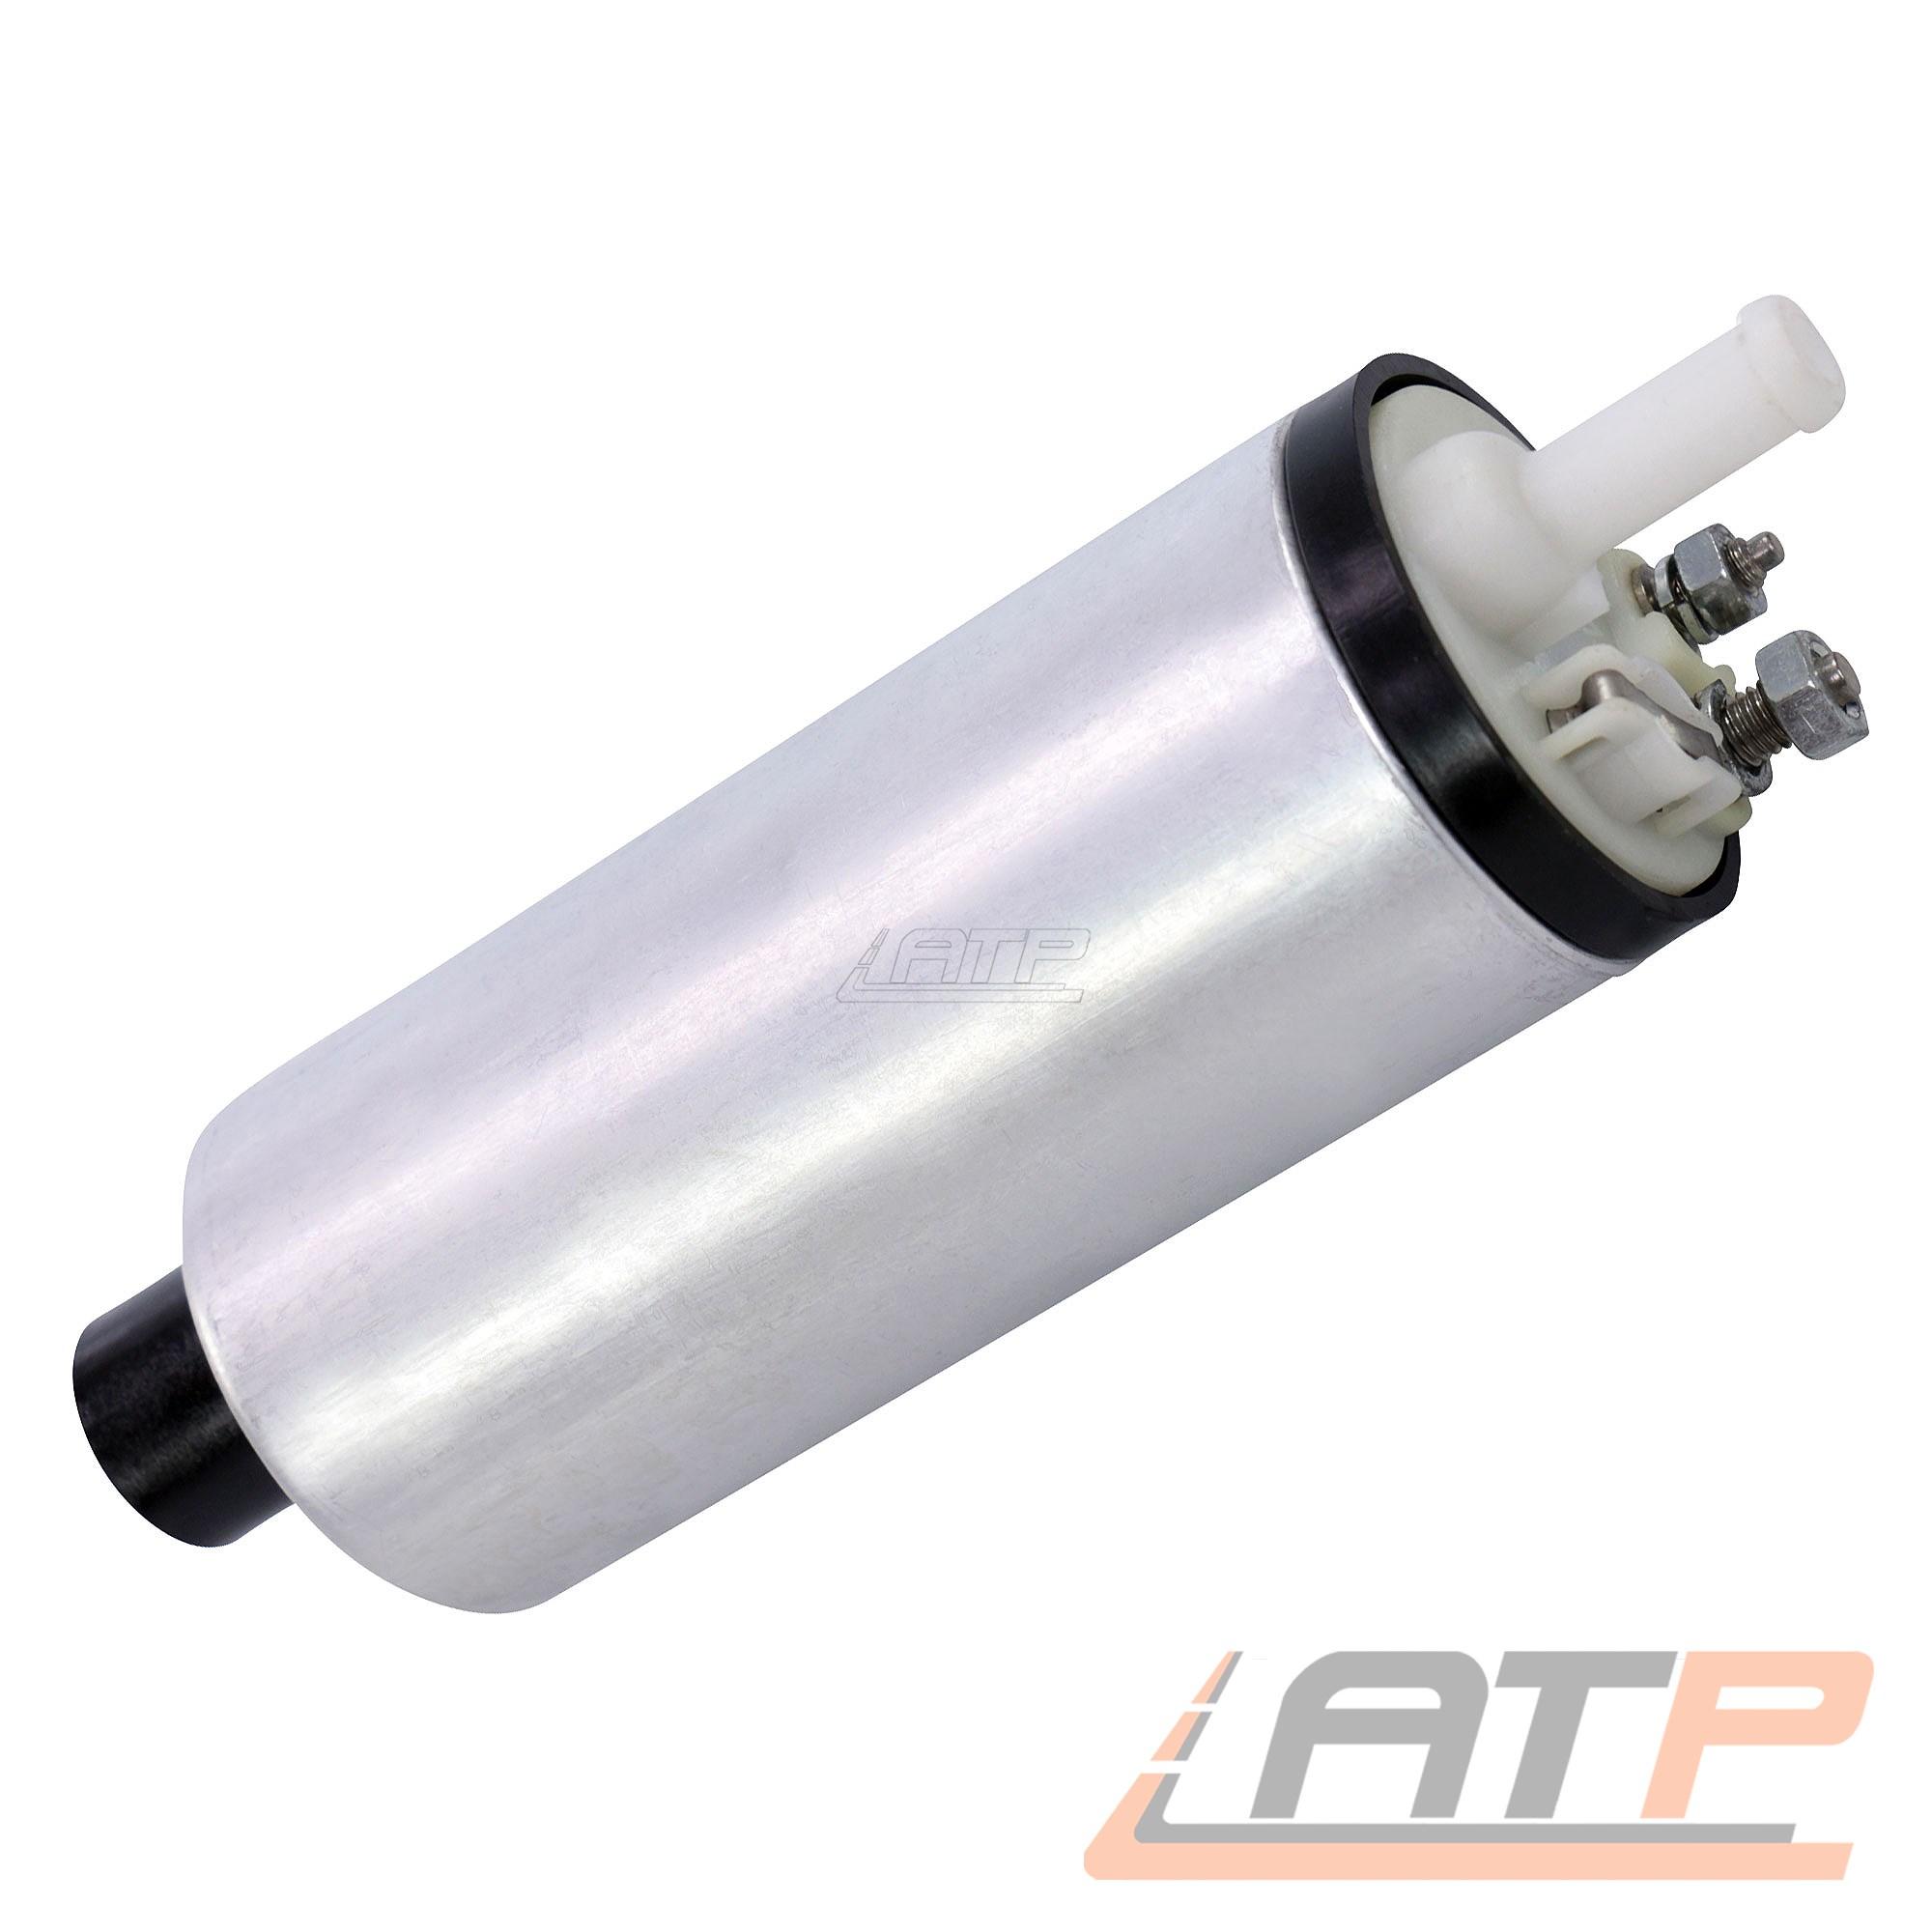 Pompe à carburant pompe à essence AUDI 80 b4 100 c3 44 2.3 100 c4 4a 2.0-s4